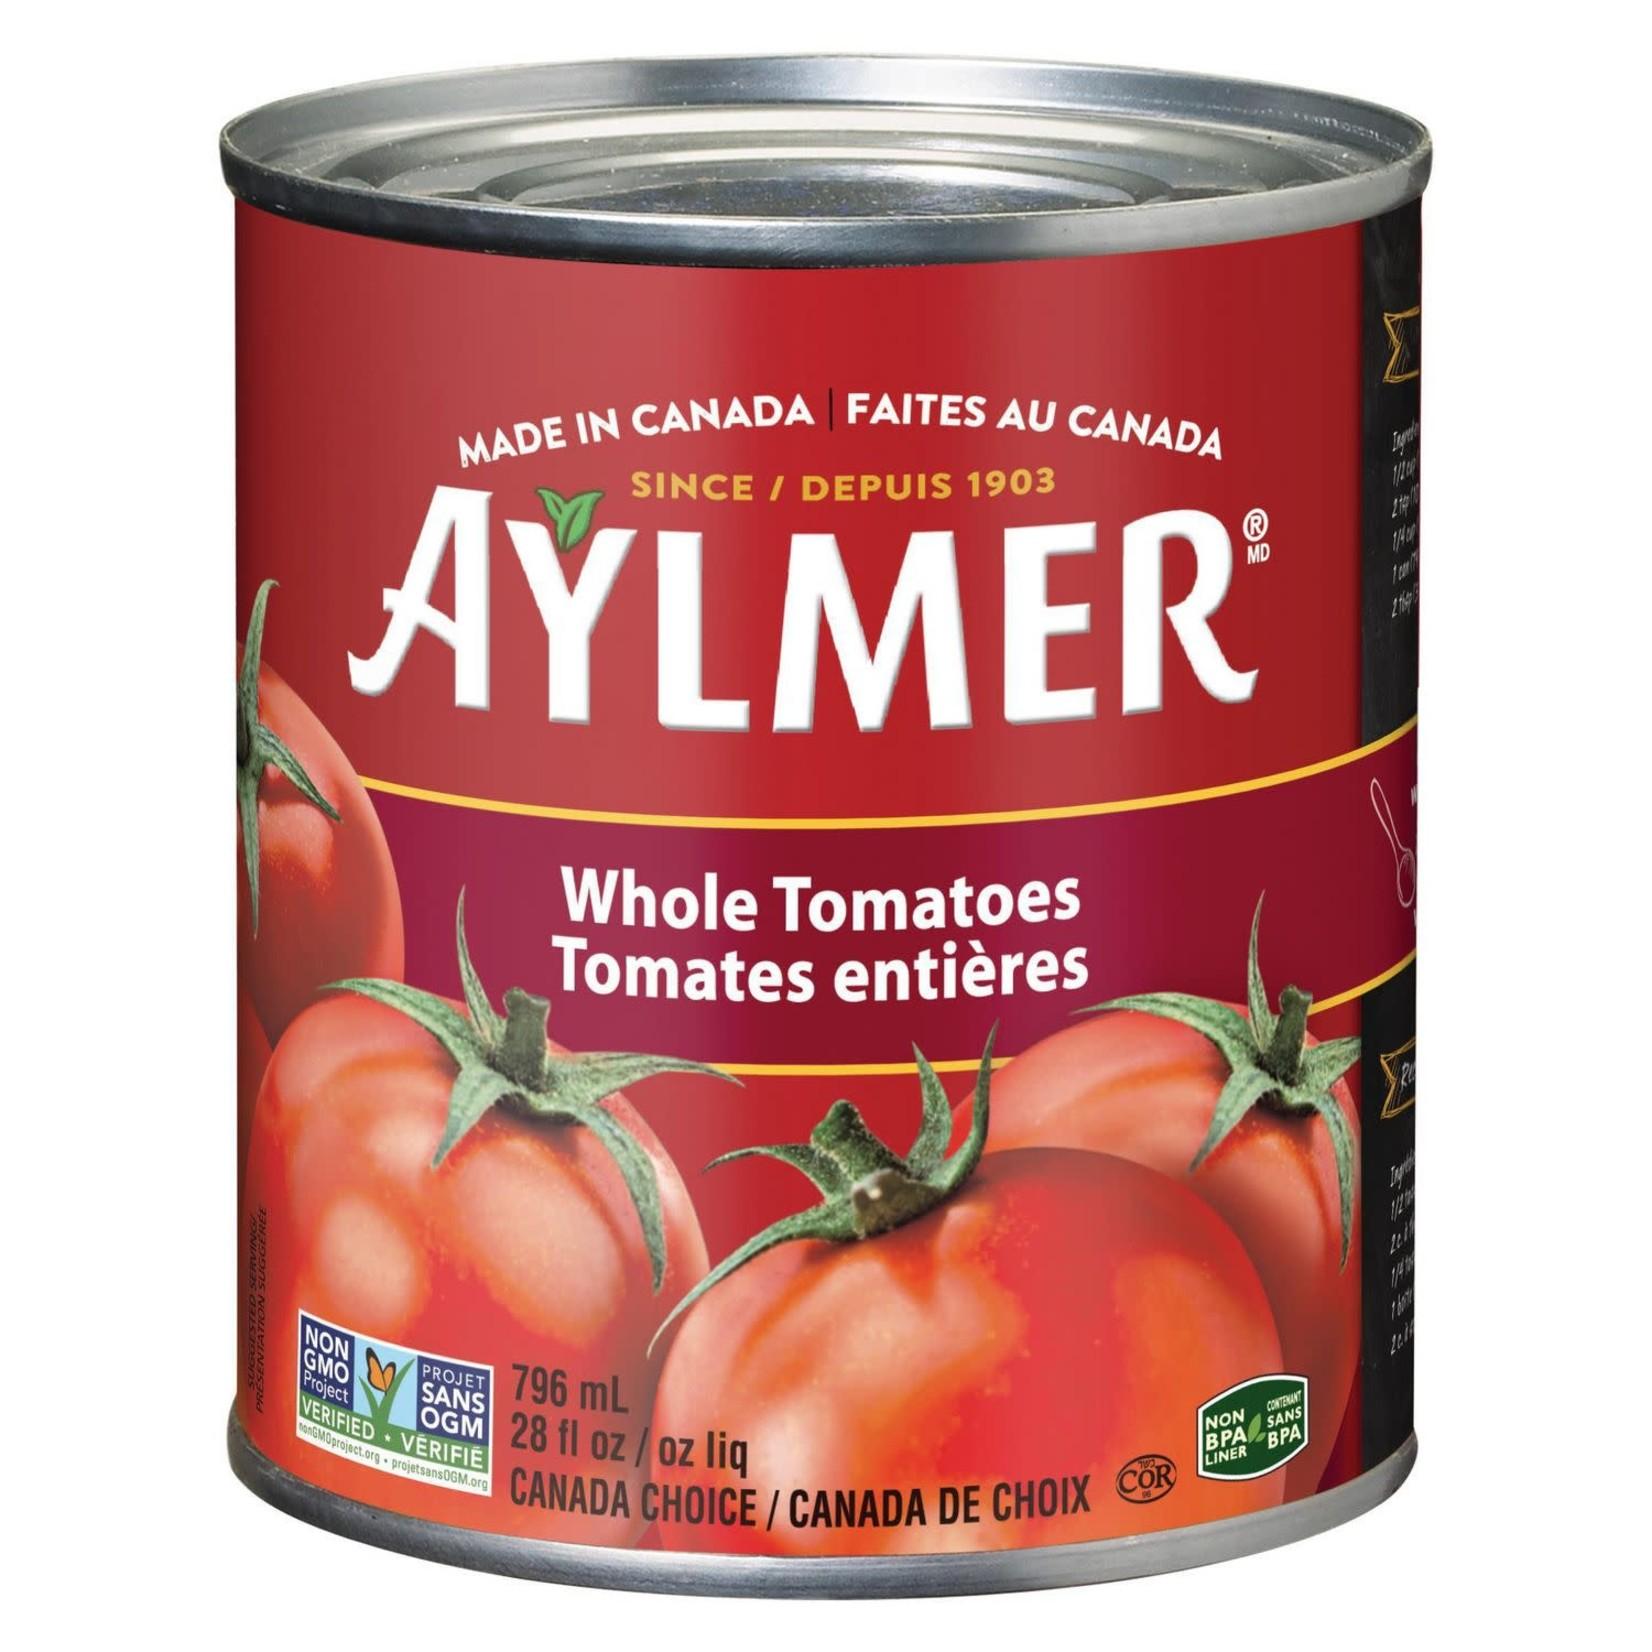 Aylmer Whole Tomatoes 540ml